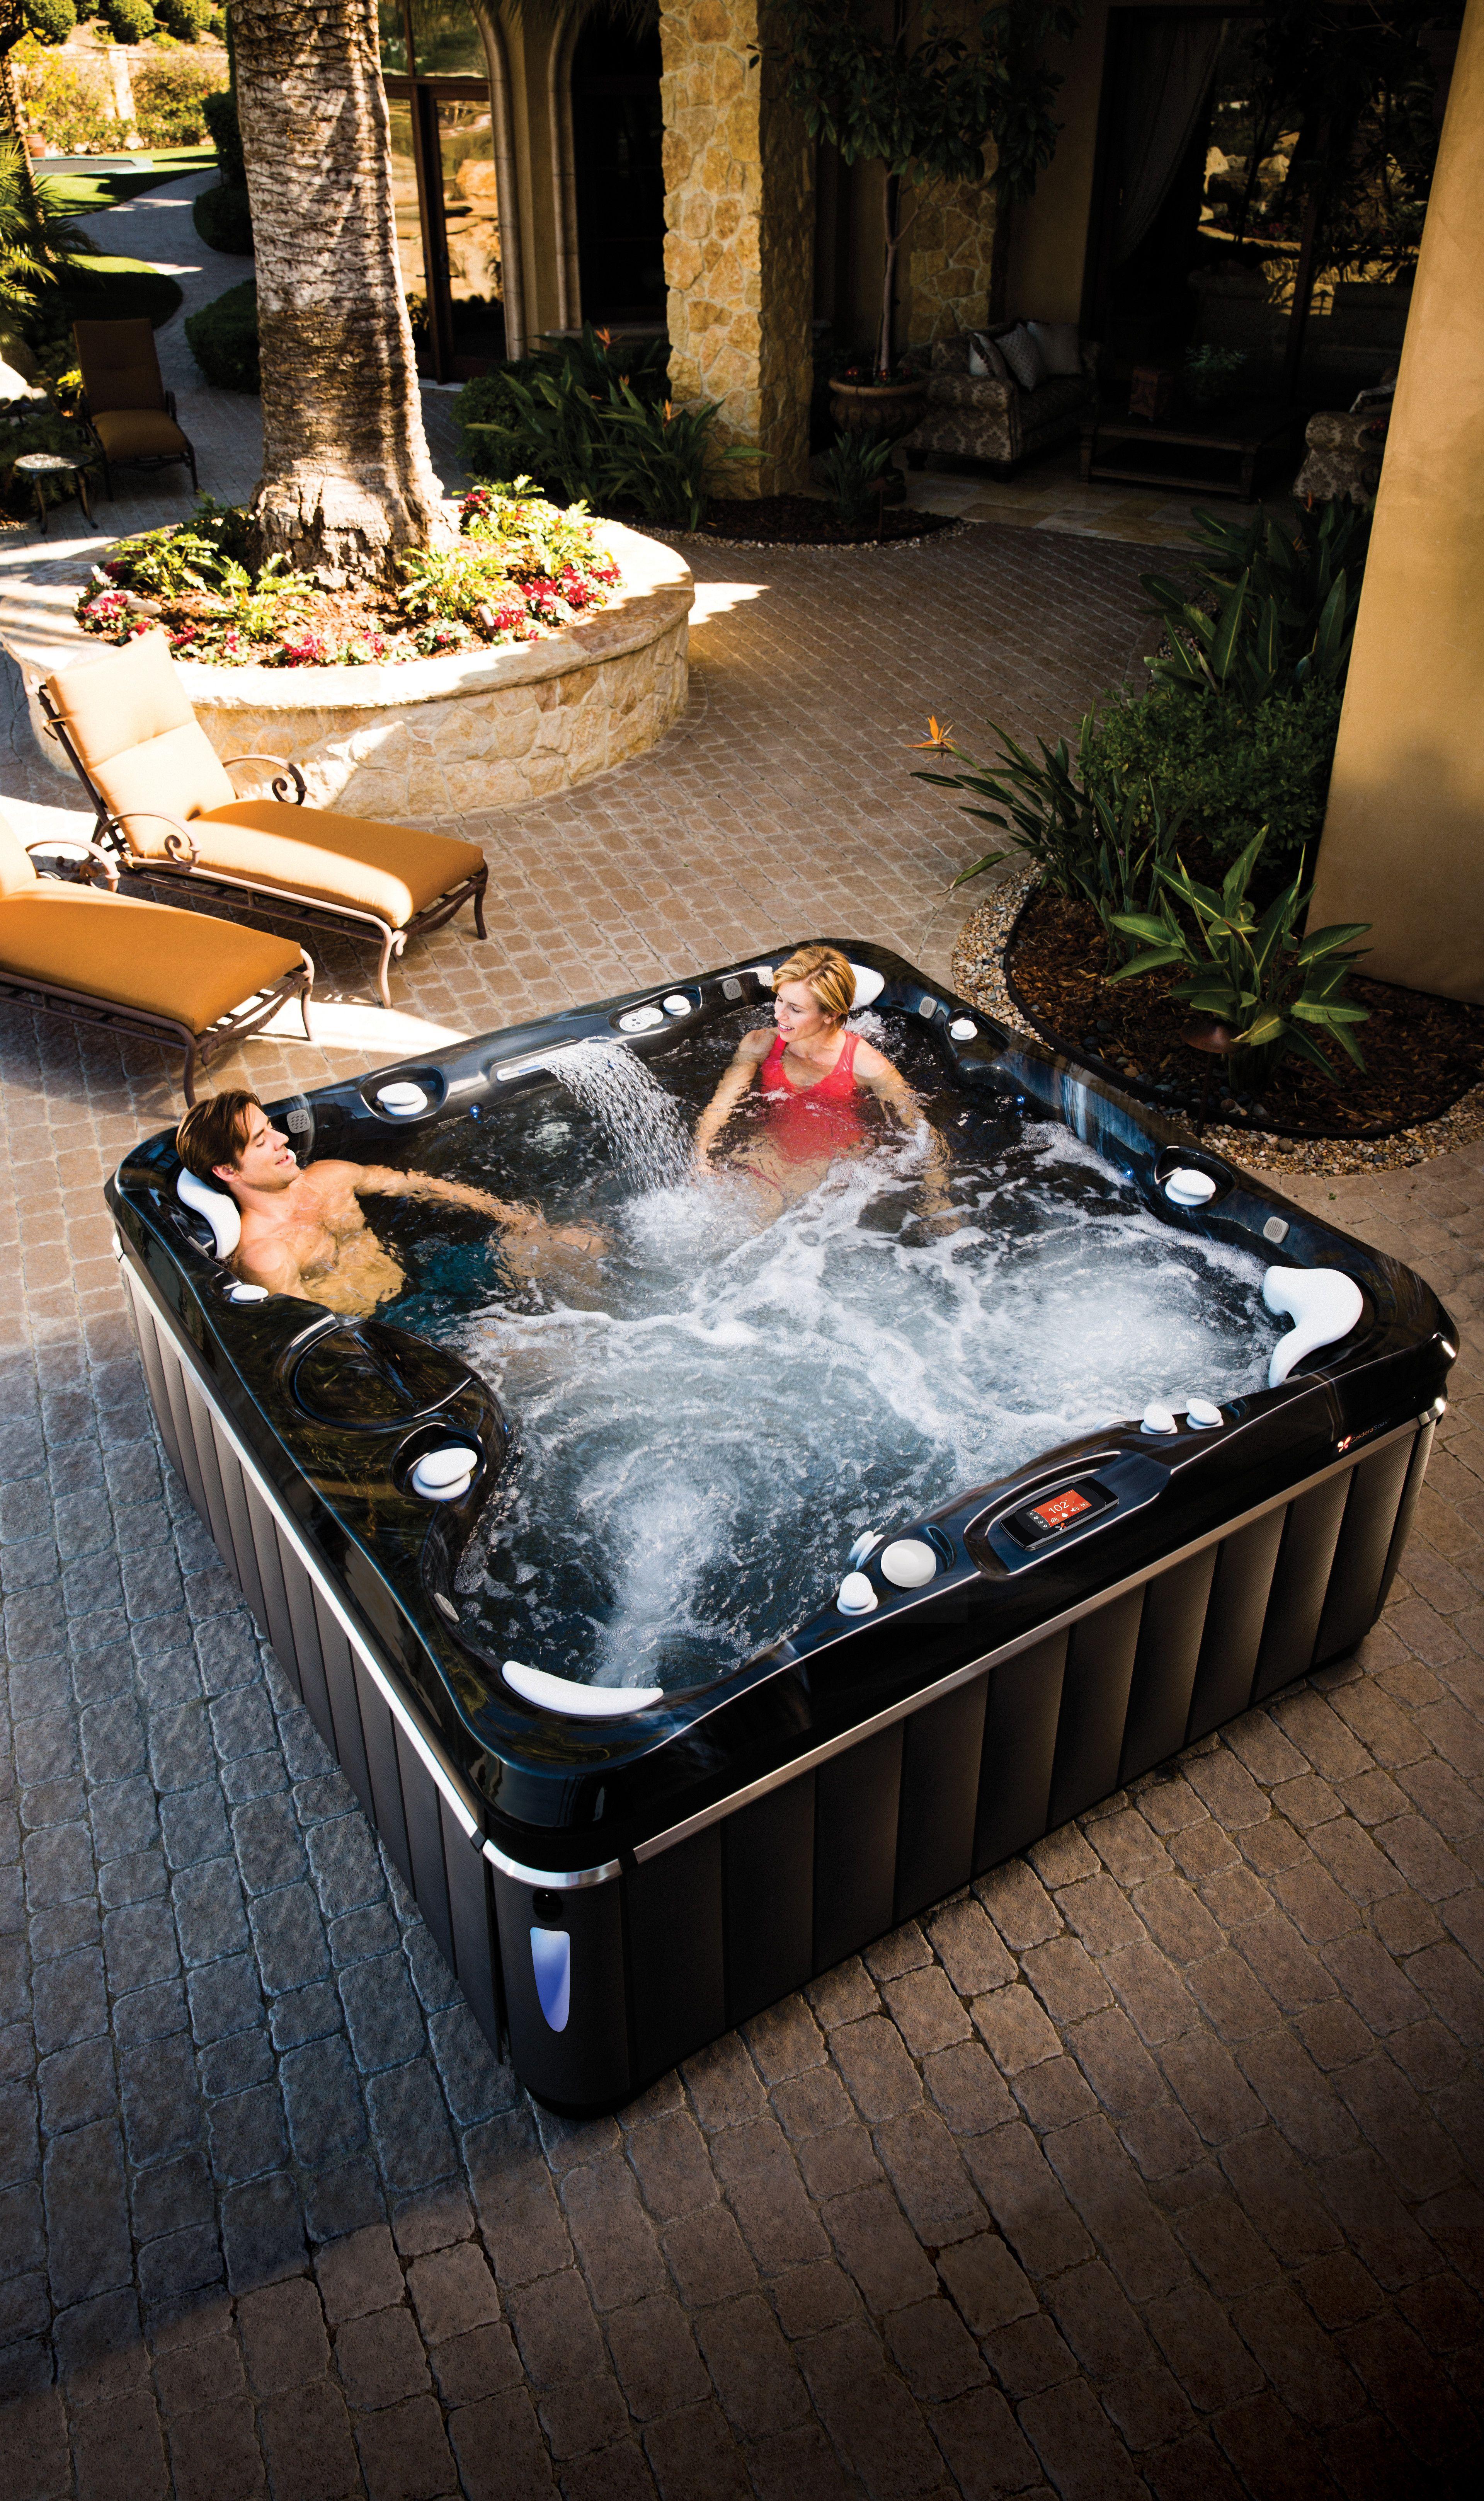 64 Caldera Spas Faq Ideas In 2021 Caldera Hot Tub Spa Hot Tubs